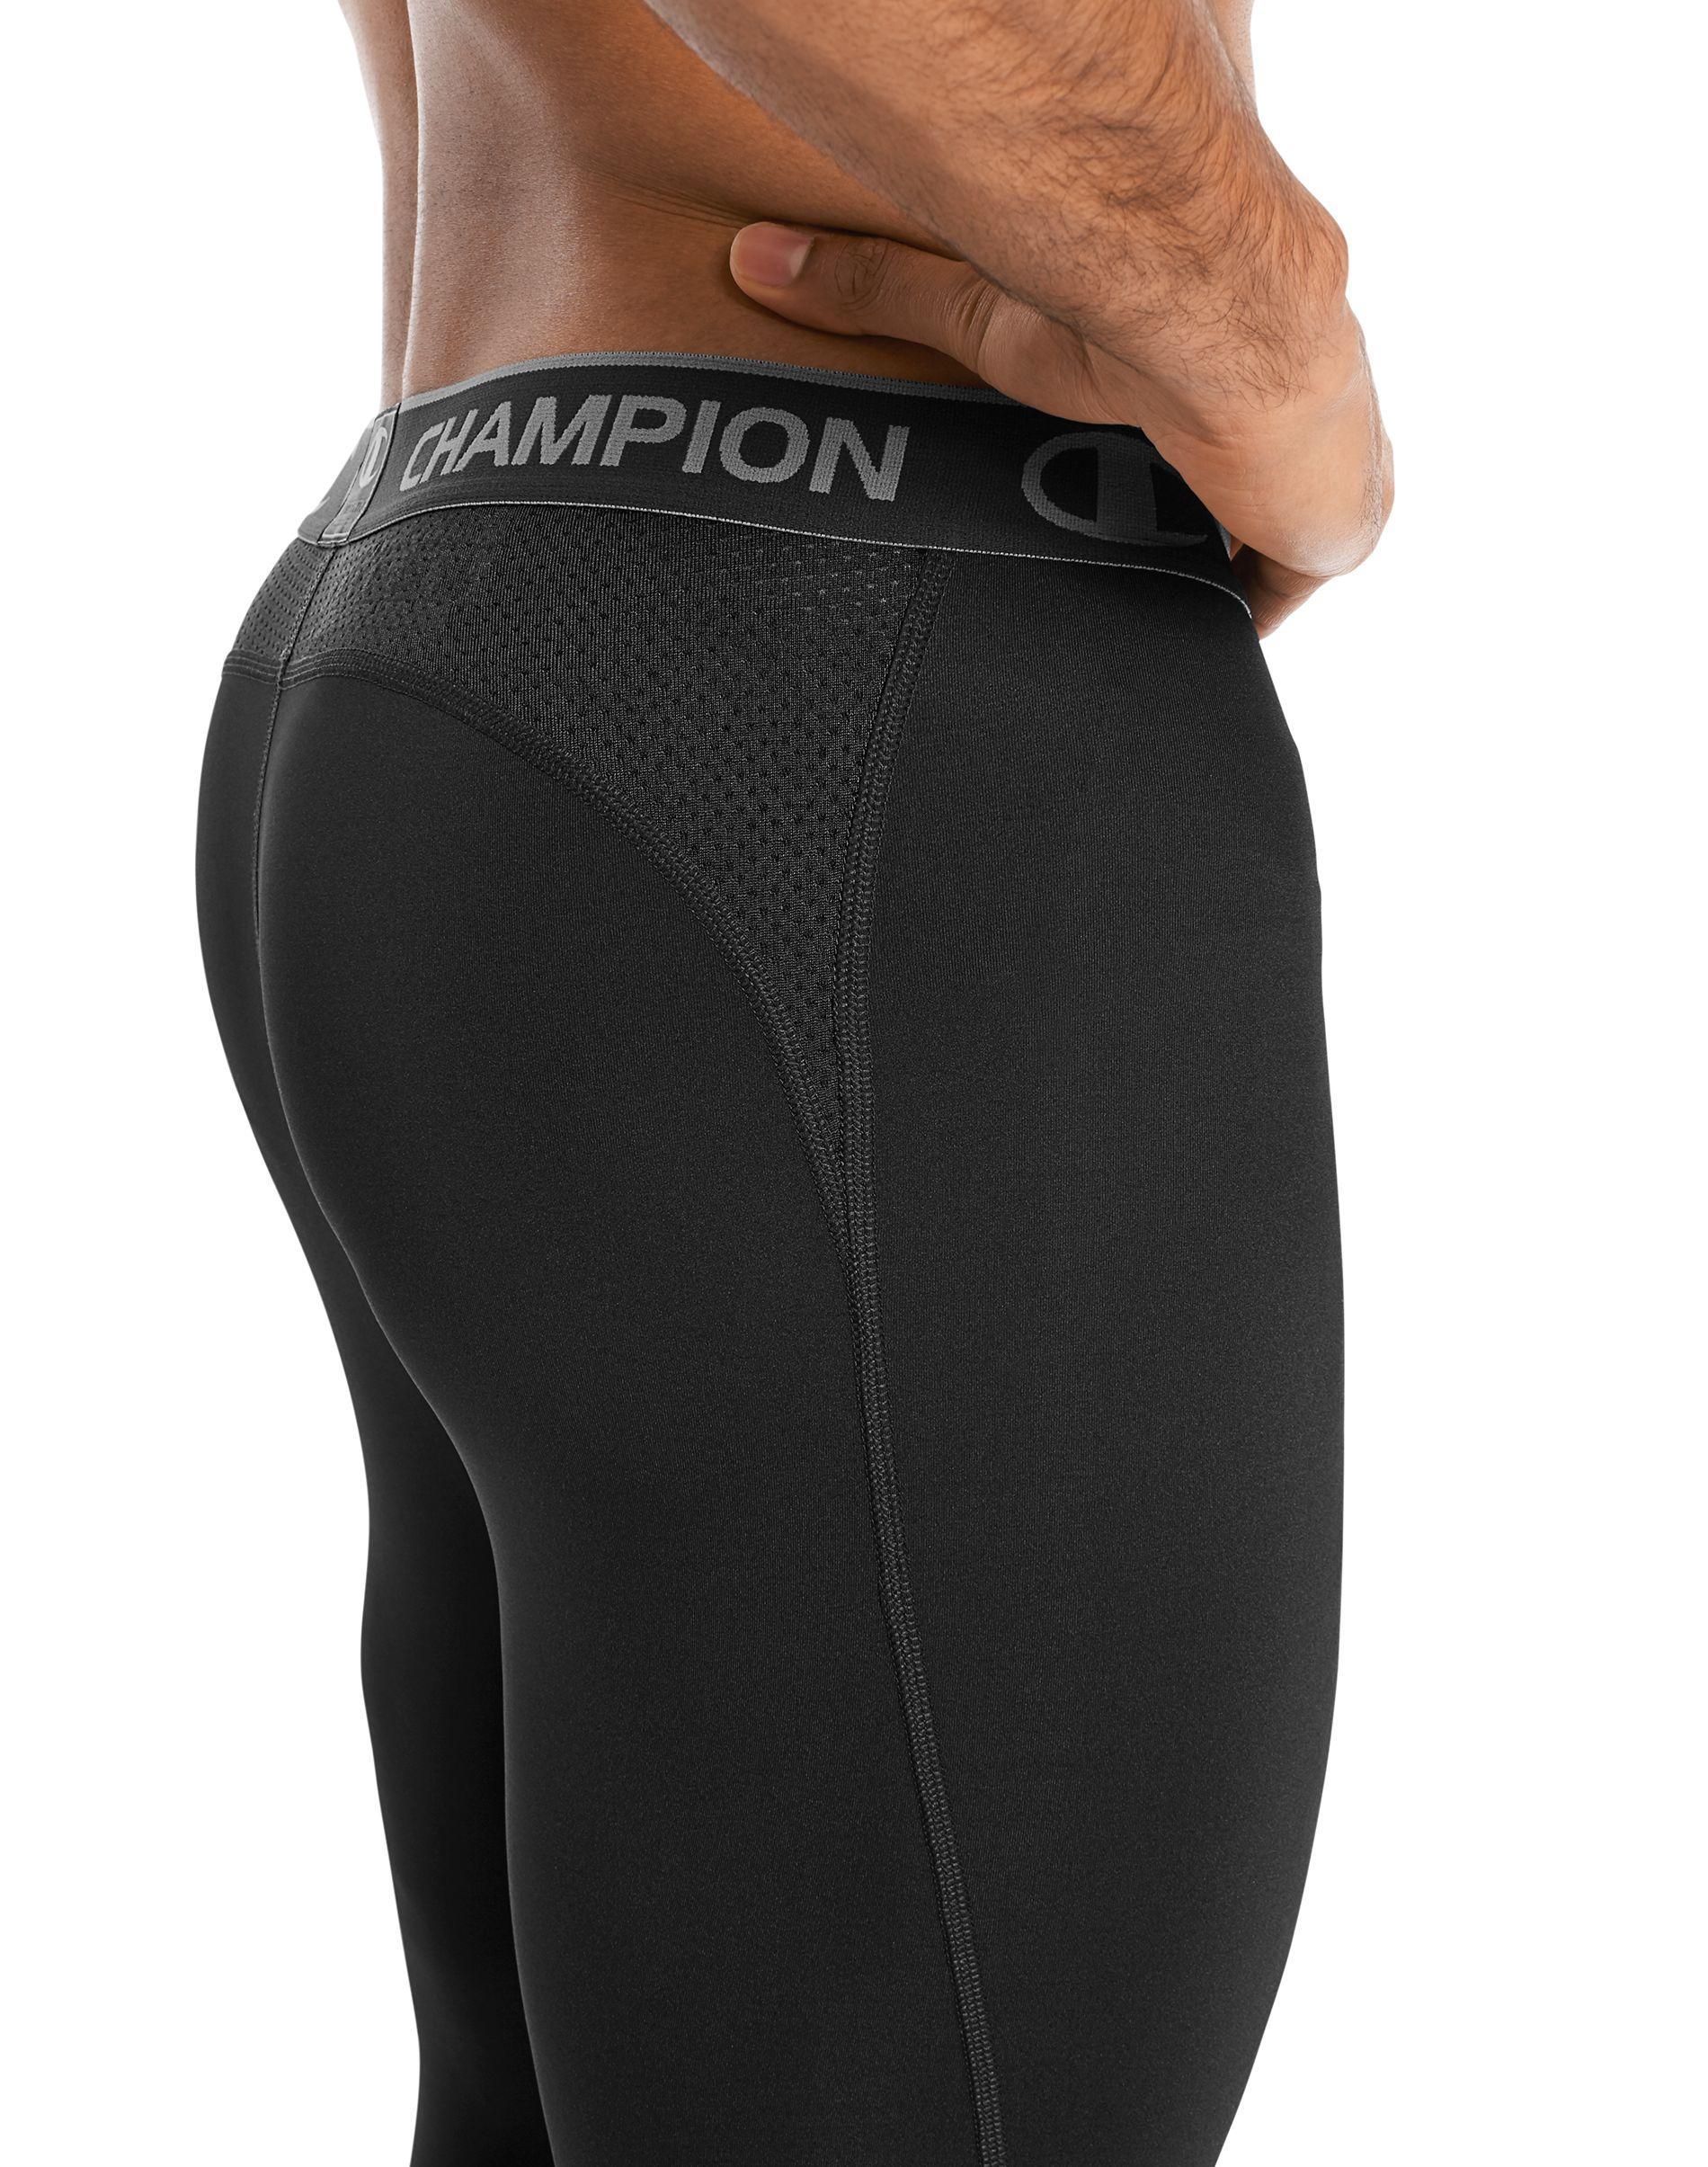 771898ad8a8c Champion - Black Powerflex Tights for Men - Lyst. View fullscreen